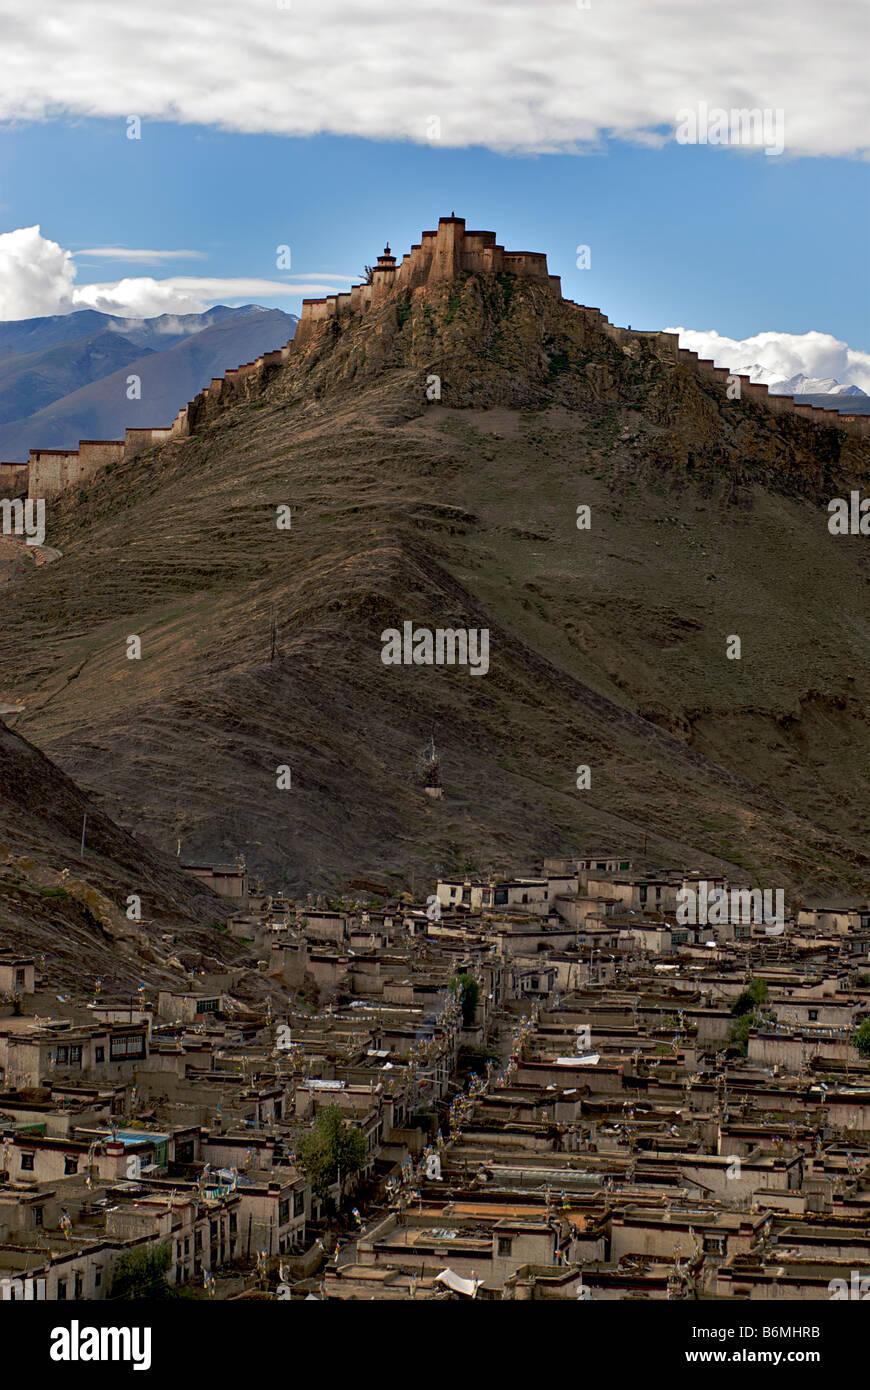 Gyantse old town viewed from Kumbum Pelkor Chöde monastery - Stock Image